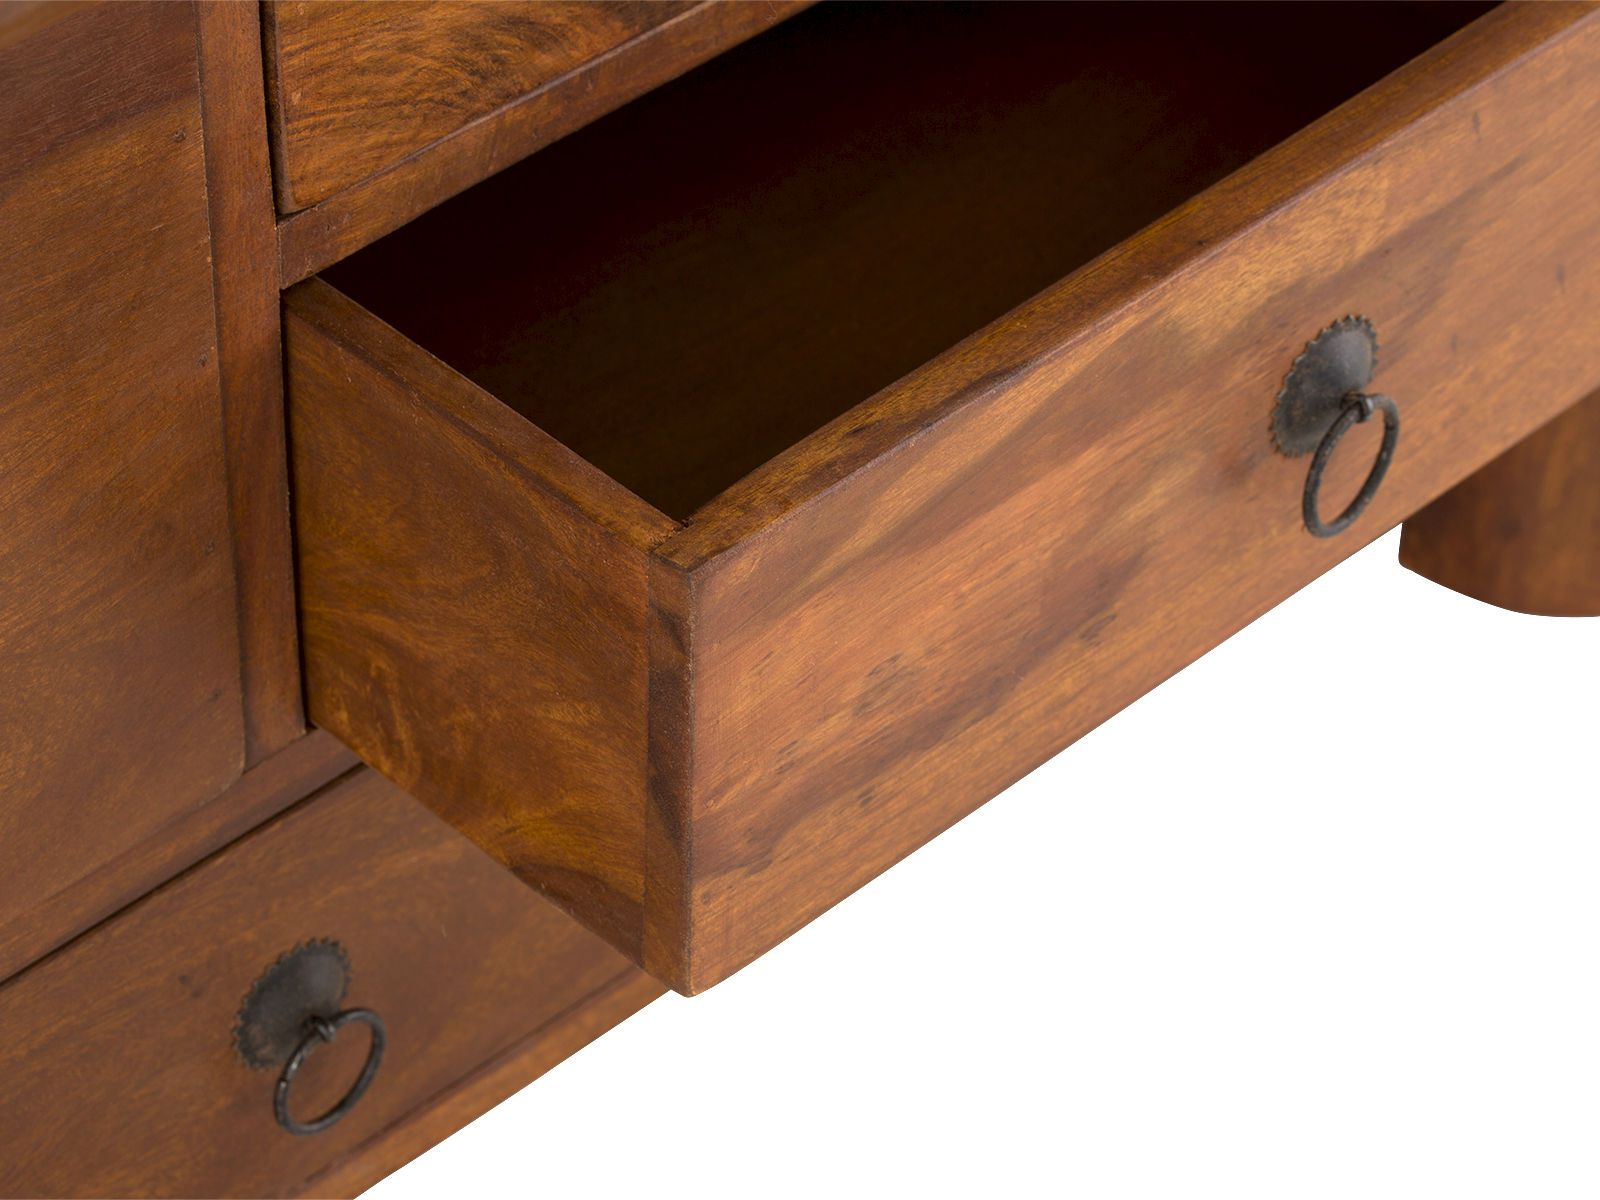 couchtisch truhe merlin iii couchtische von massivum. Black Bedroom Furniture Sets. Home Design Ideas